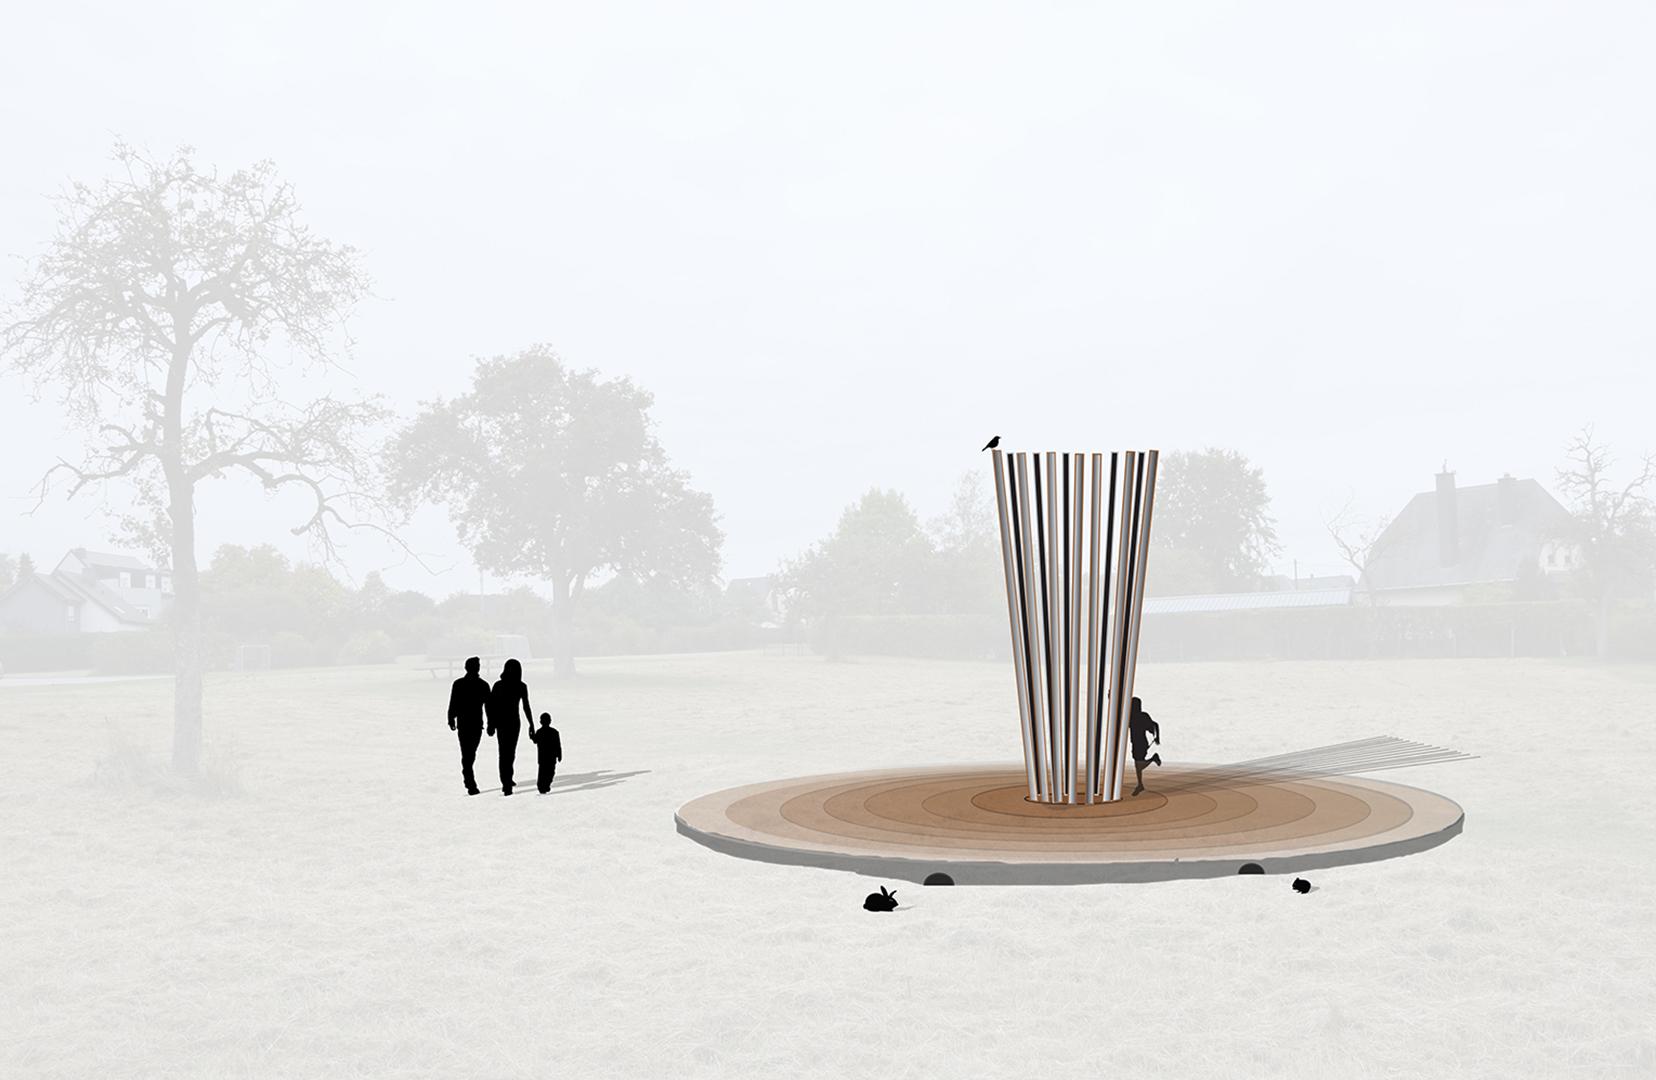 drawing, Project, sculpture, model, public sculpture, public art, architecture, contemporary art, art, Thierry Ferreira, design, installation, sitespecific, photography, video, Landart, Luxembourg